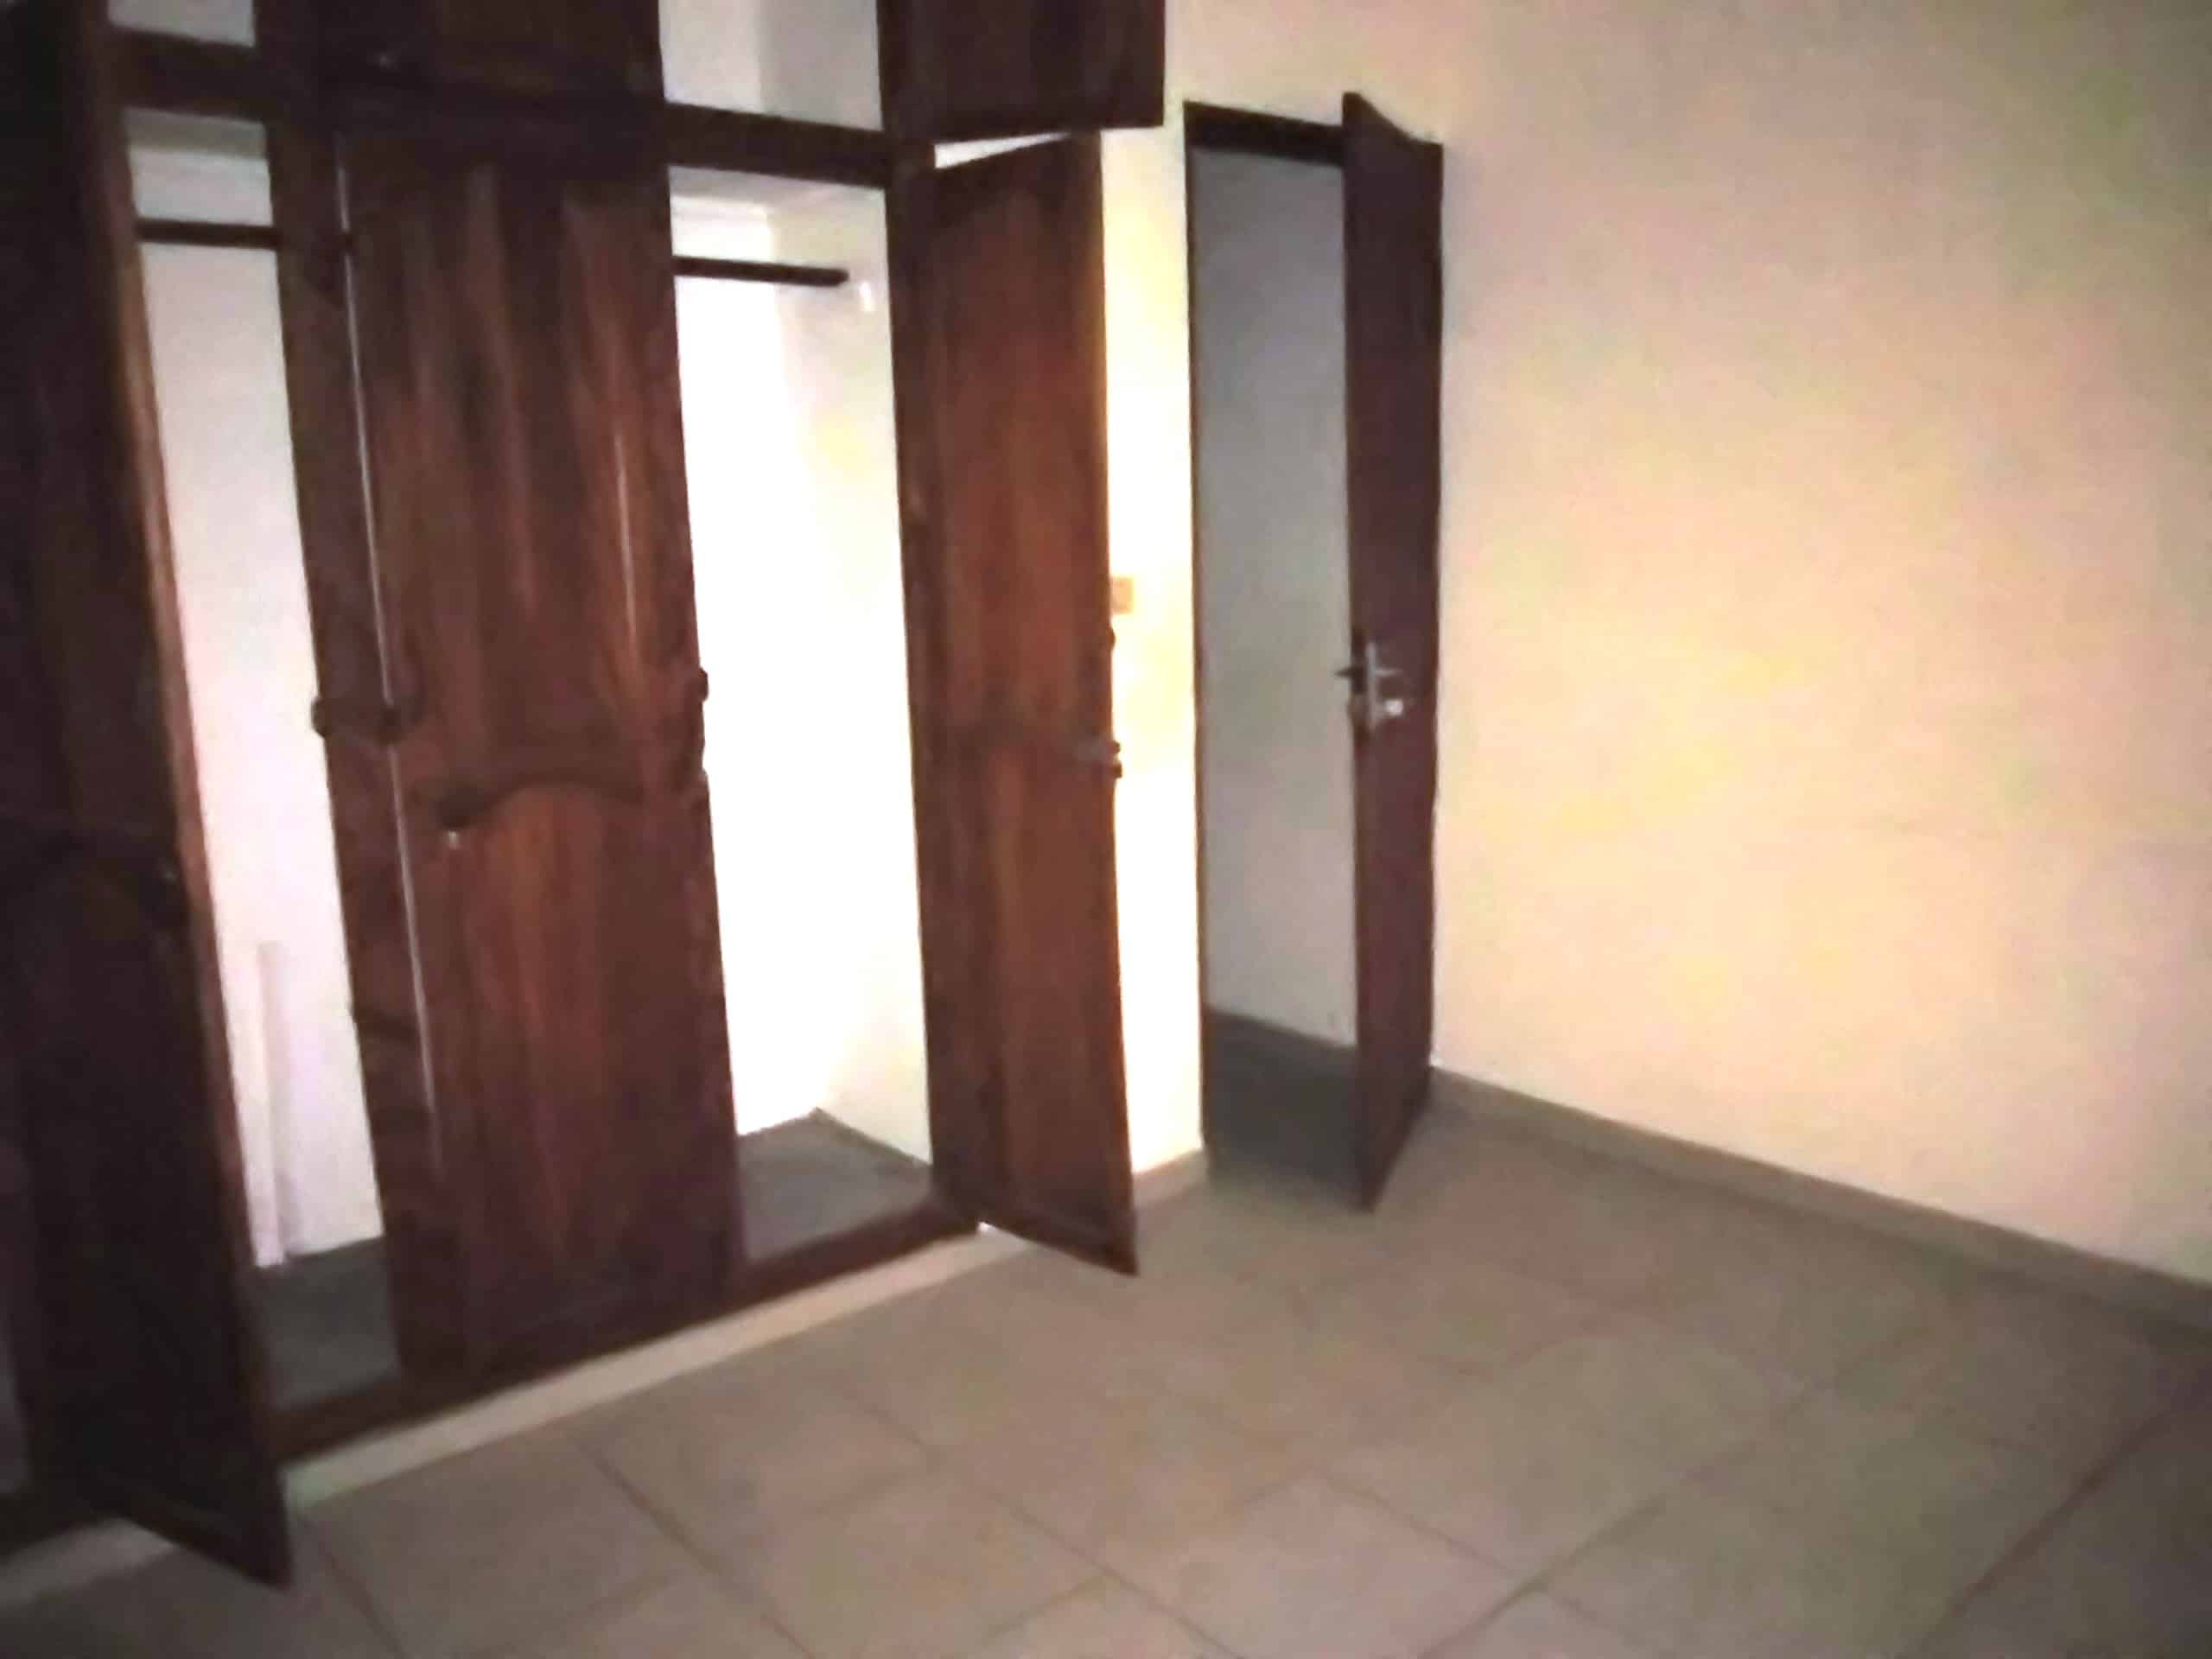 Chambre à louer - Douala, Makepe, petit pays - 35 000 FCFA / mois